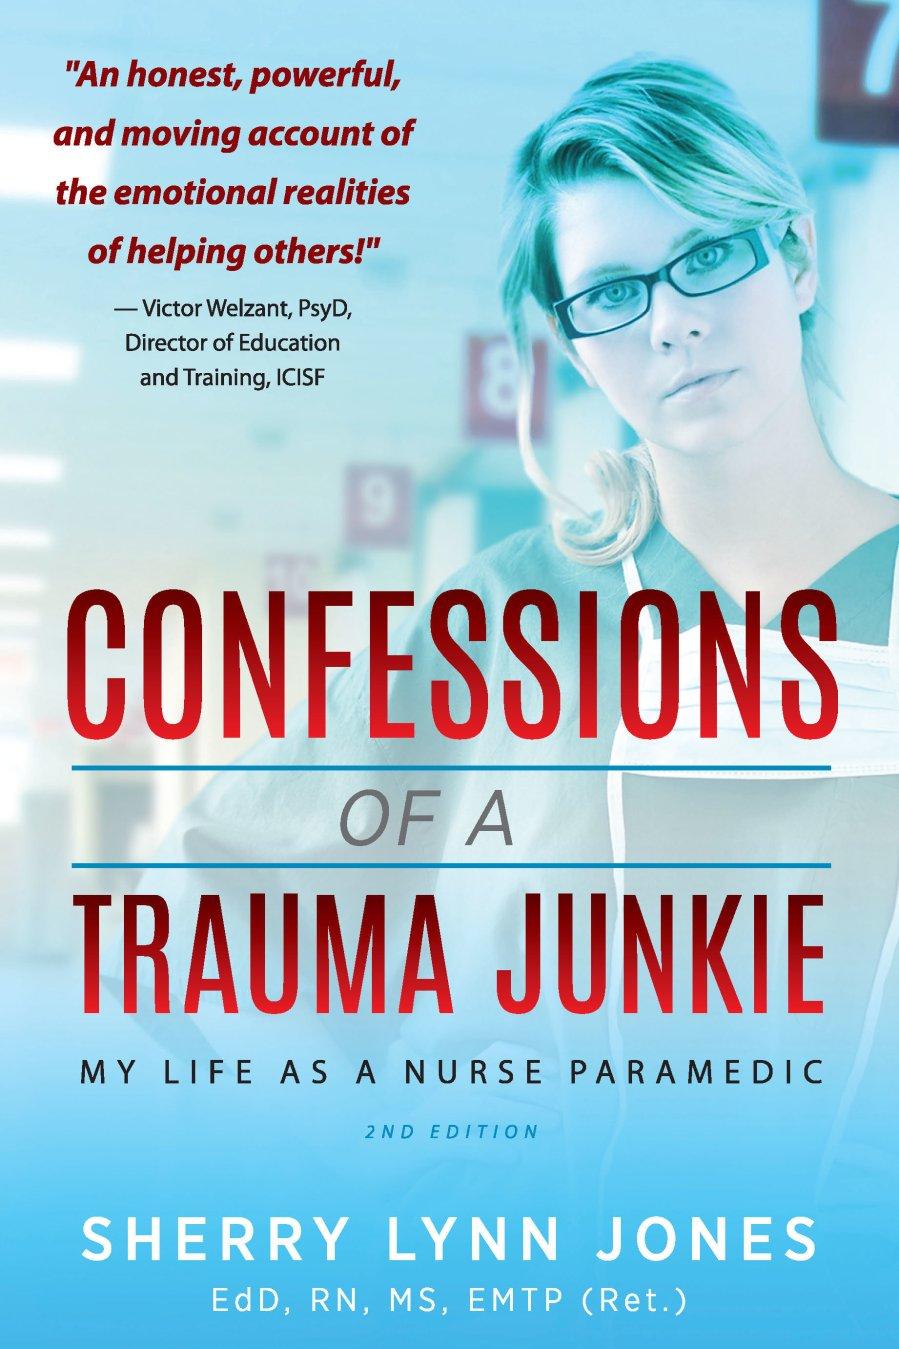 Confessions of a Trauma Junkie: My Life as a Nurse Paramedic 978-1-61599-341-3